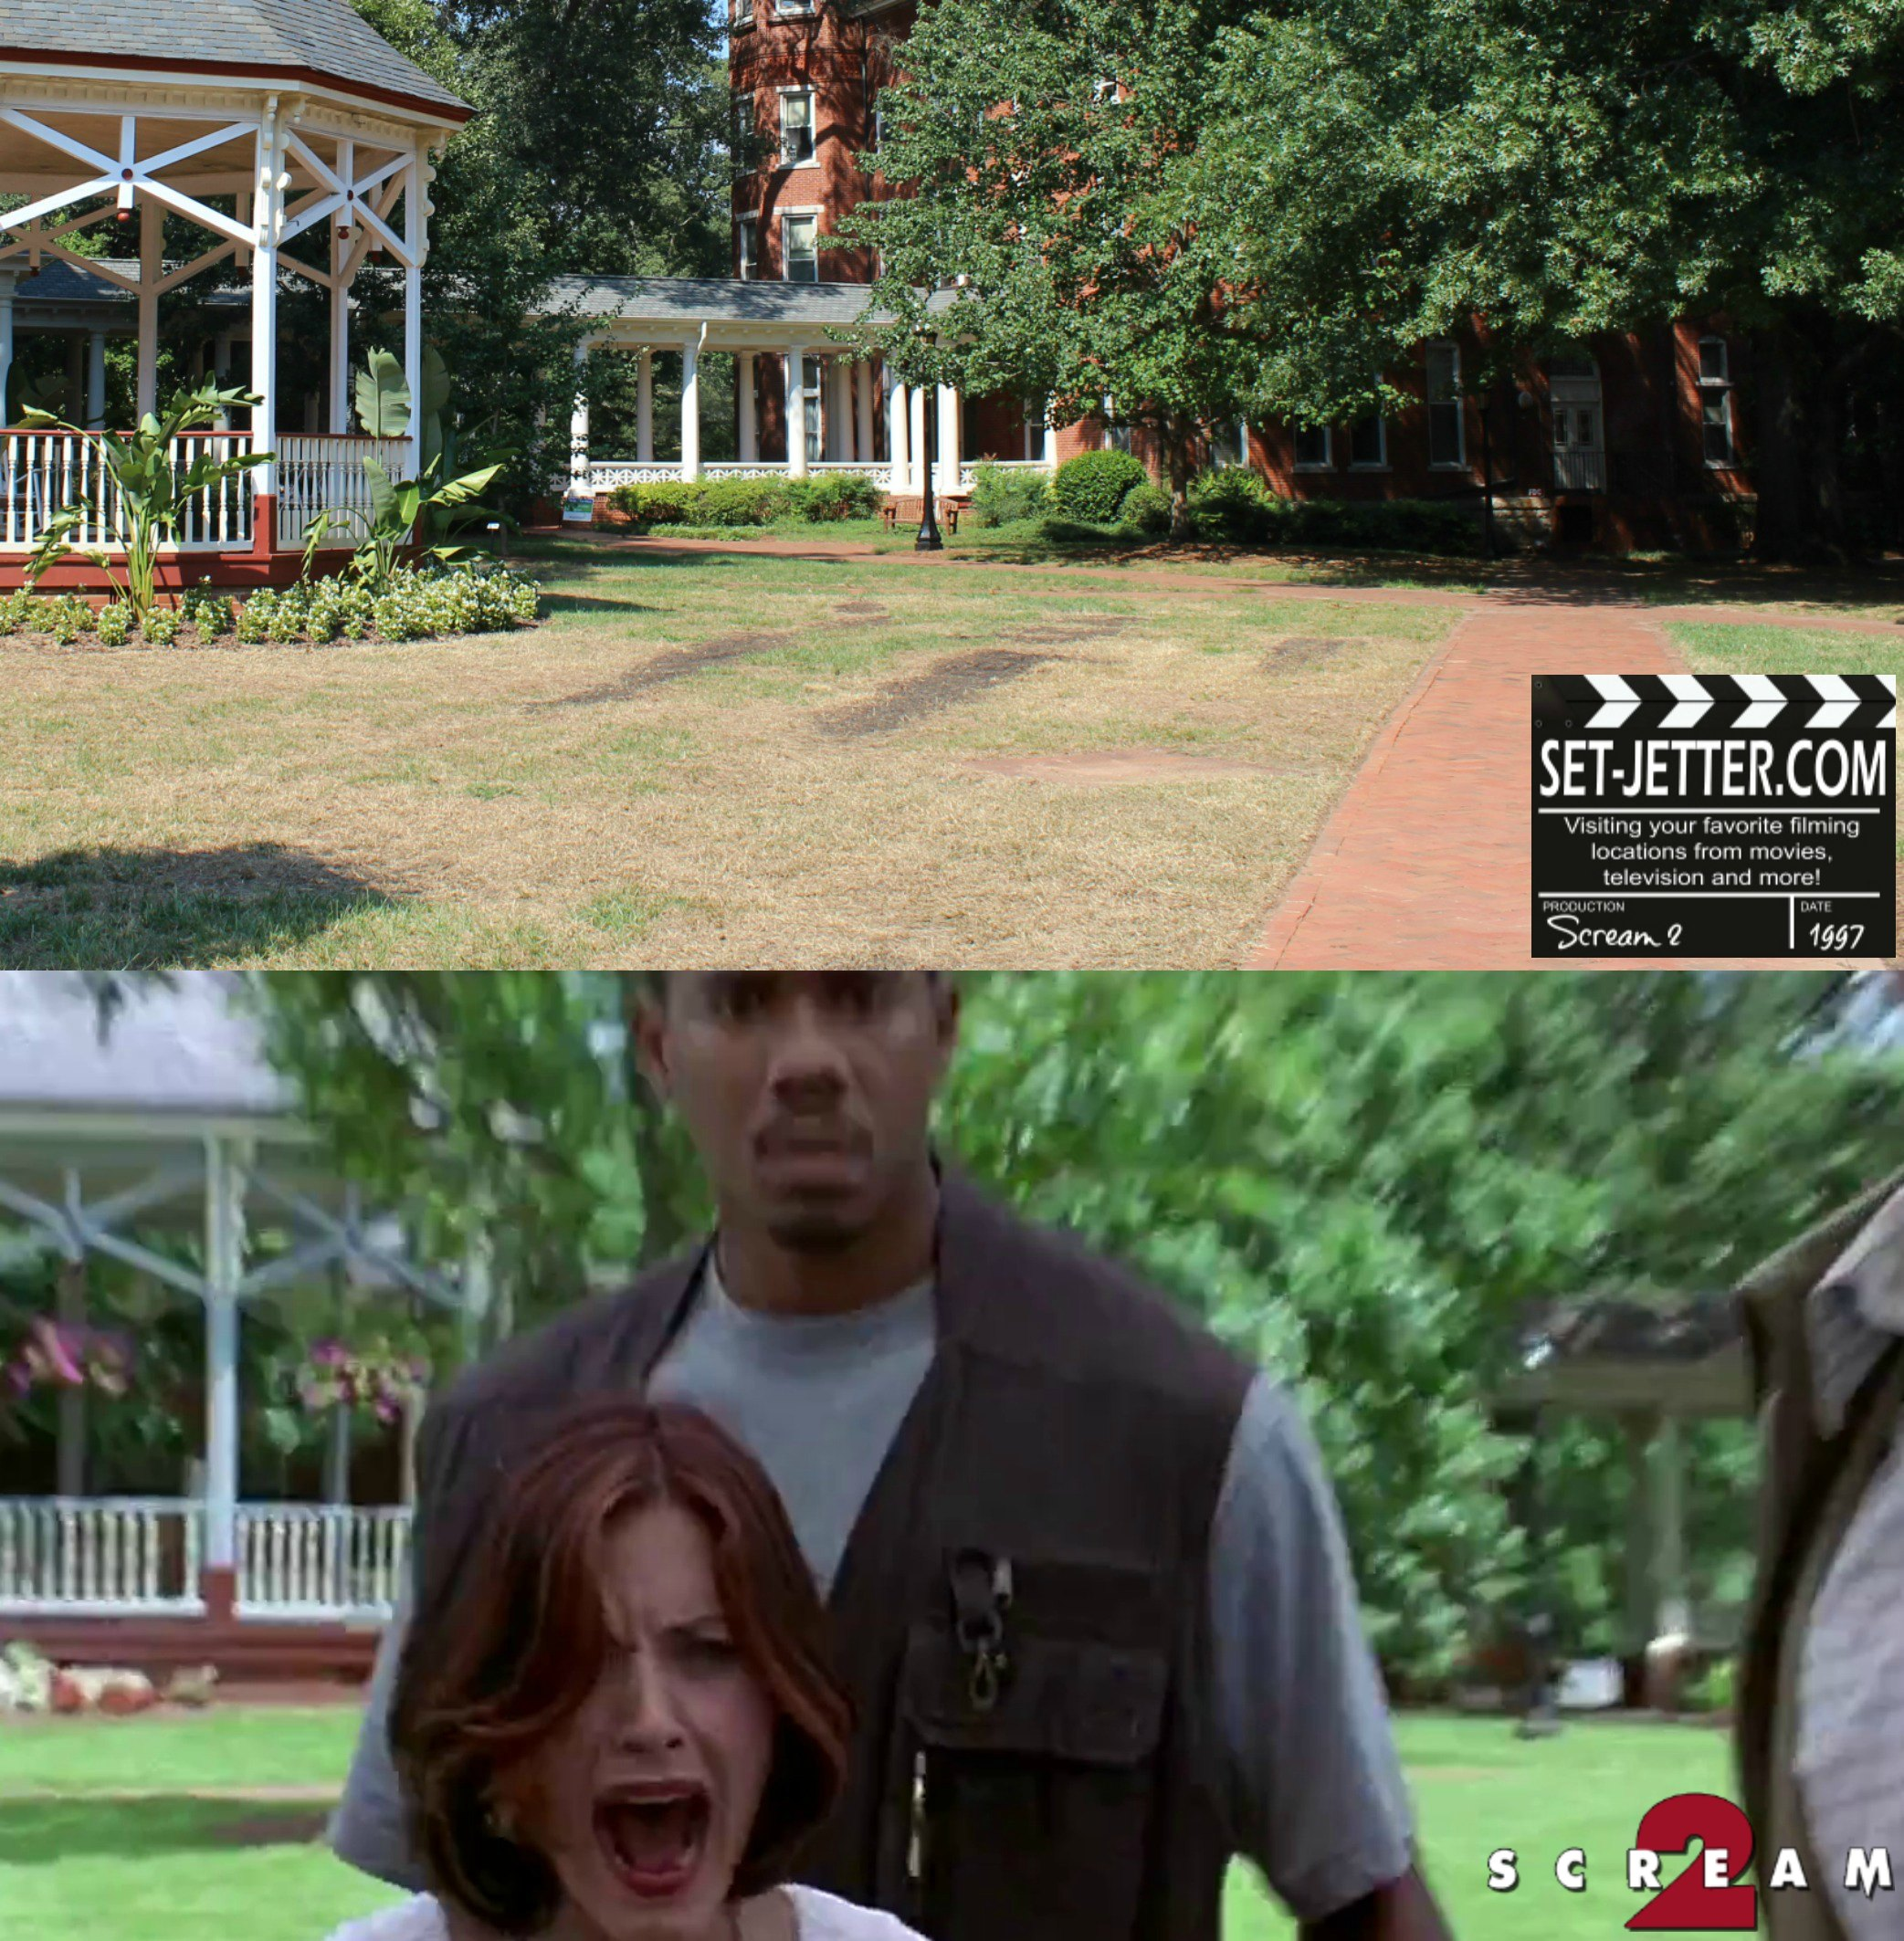 Scream 2 comparison 175.jpg